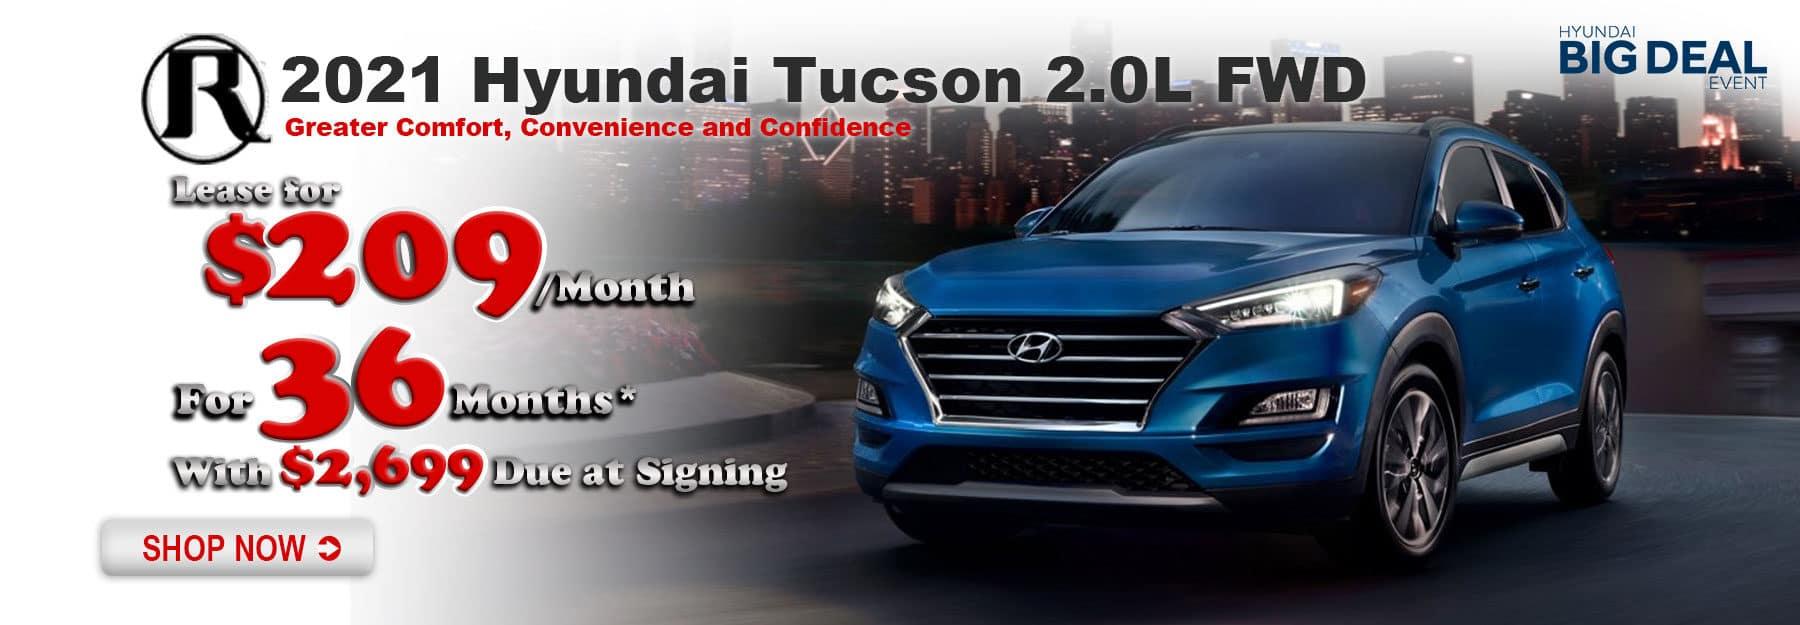 Reed Hyundai Tucson